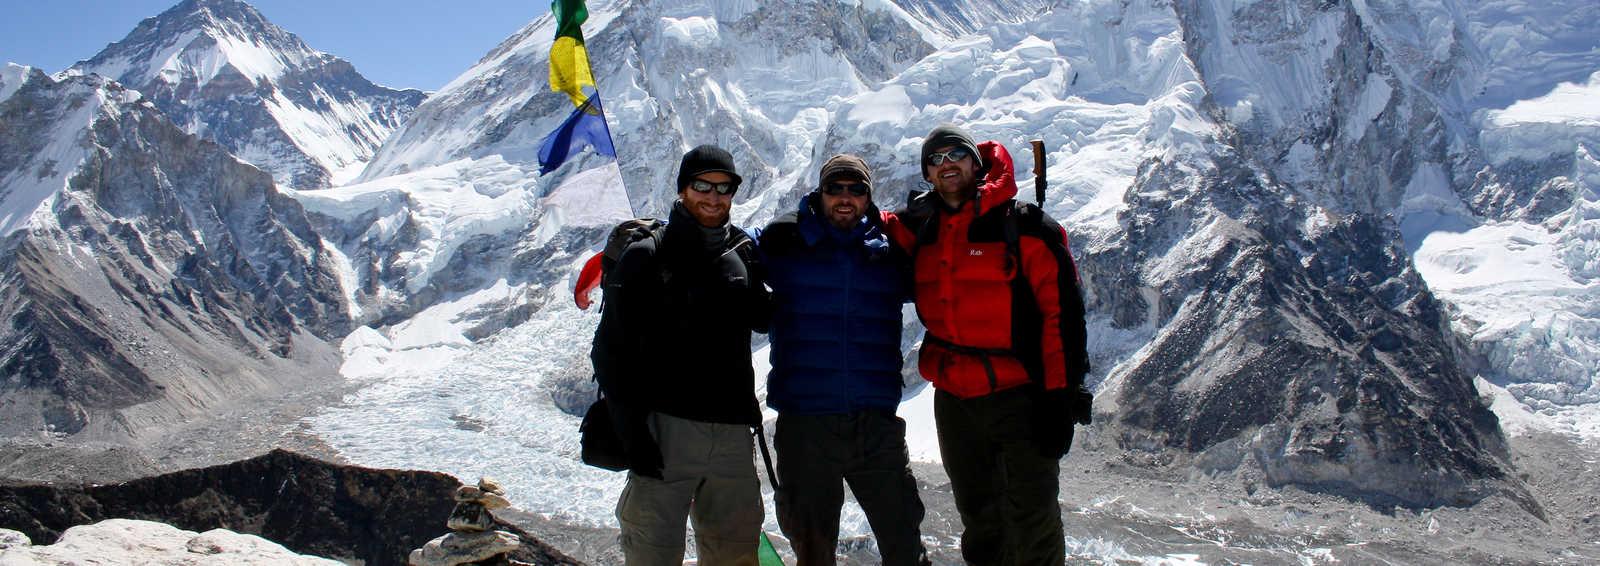 Group summit of Kala Pattar (5545m). Mt Everest in the background, Everest Basecamp Trek